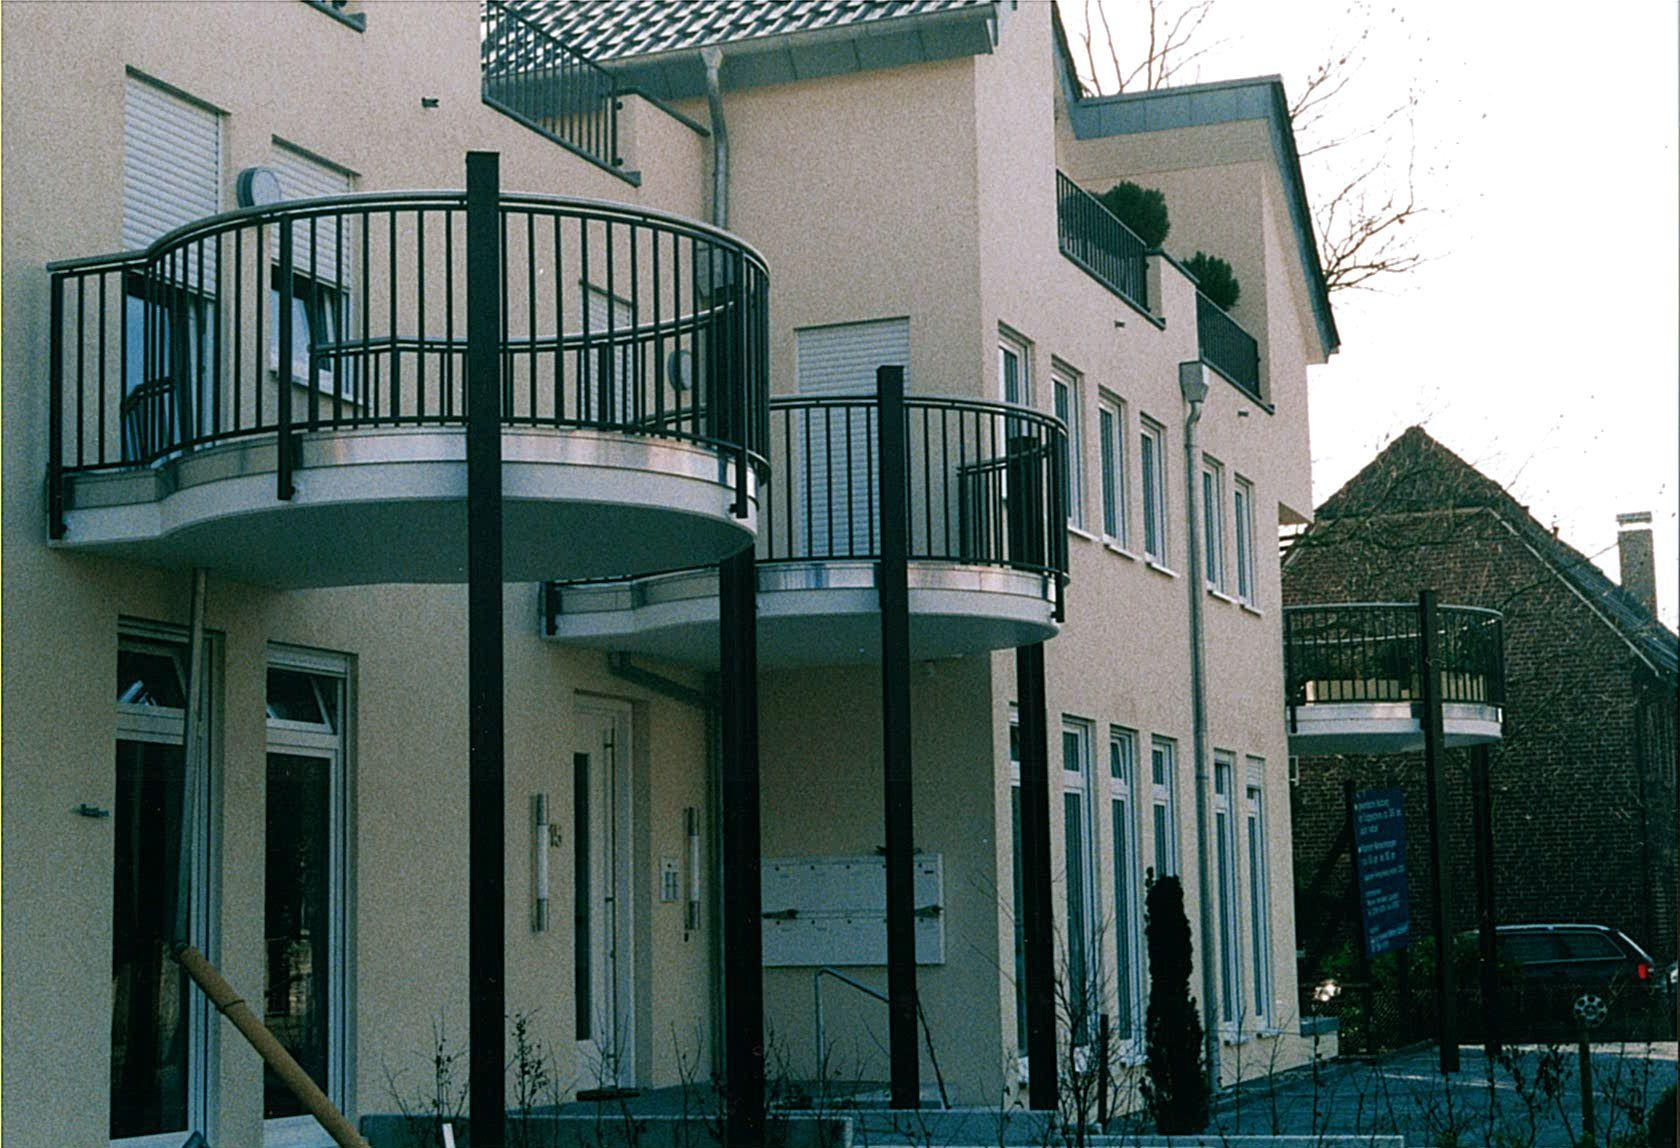 holzfliesen balkon rund kreative ideen f r. Black Bedroom Furniture Sets. Home Design Ideas